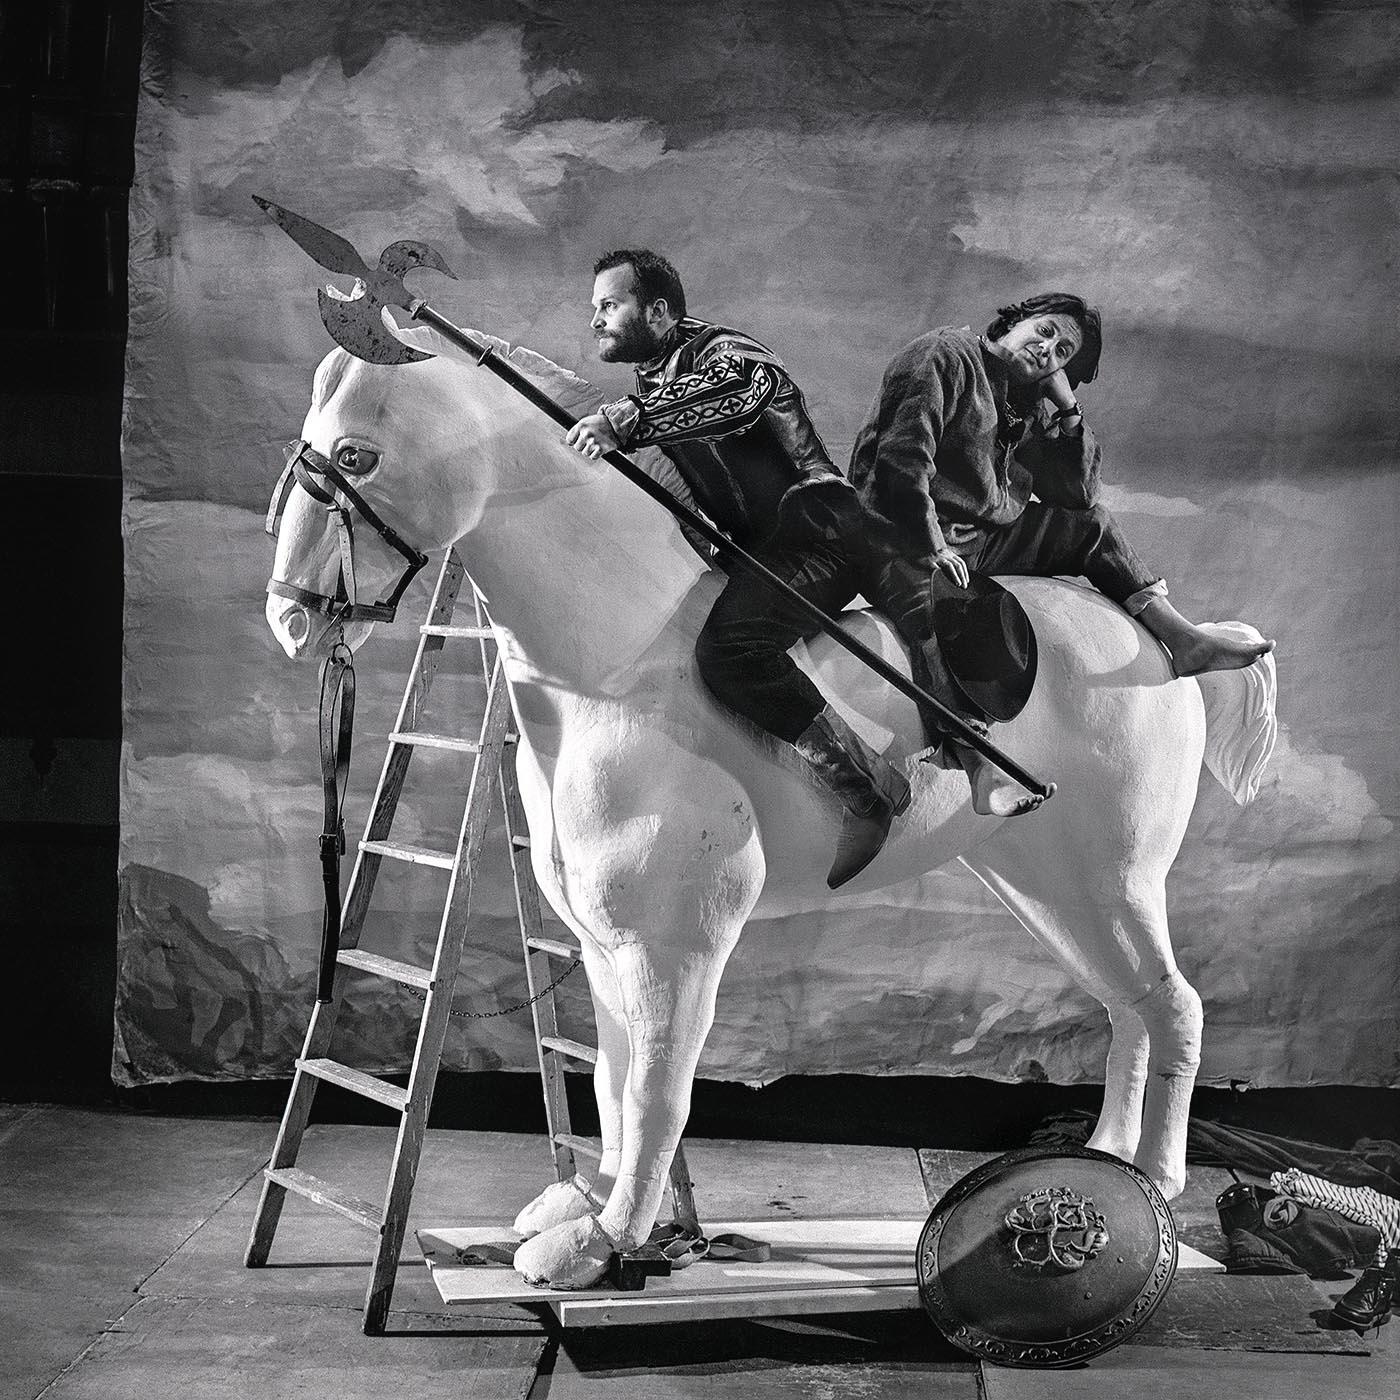 Režiseri Boris i Tucko © Stanislav Sharp (Djordje Milekic)